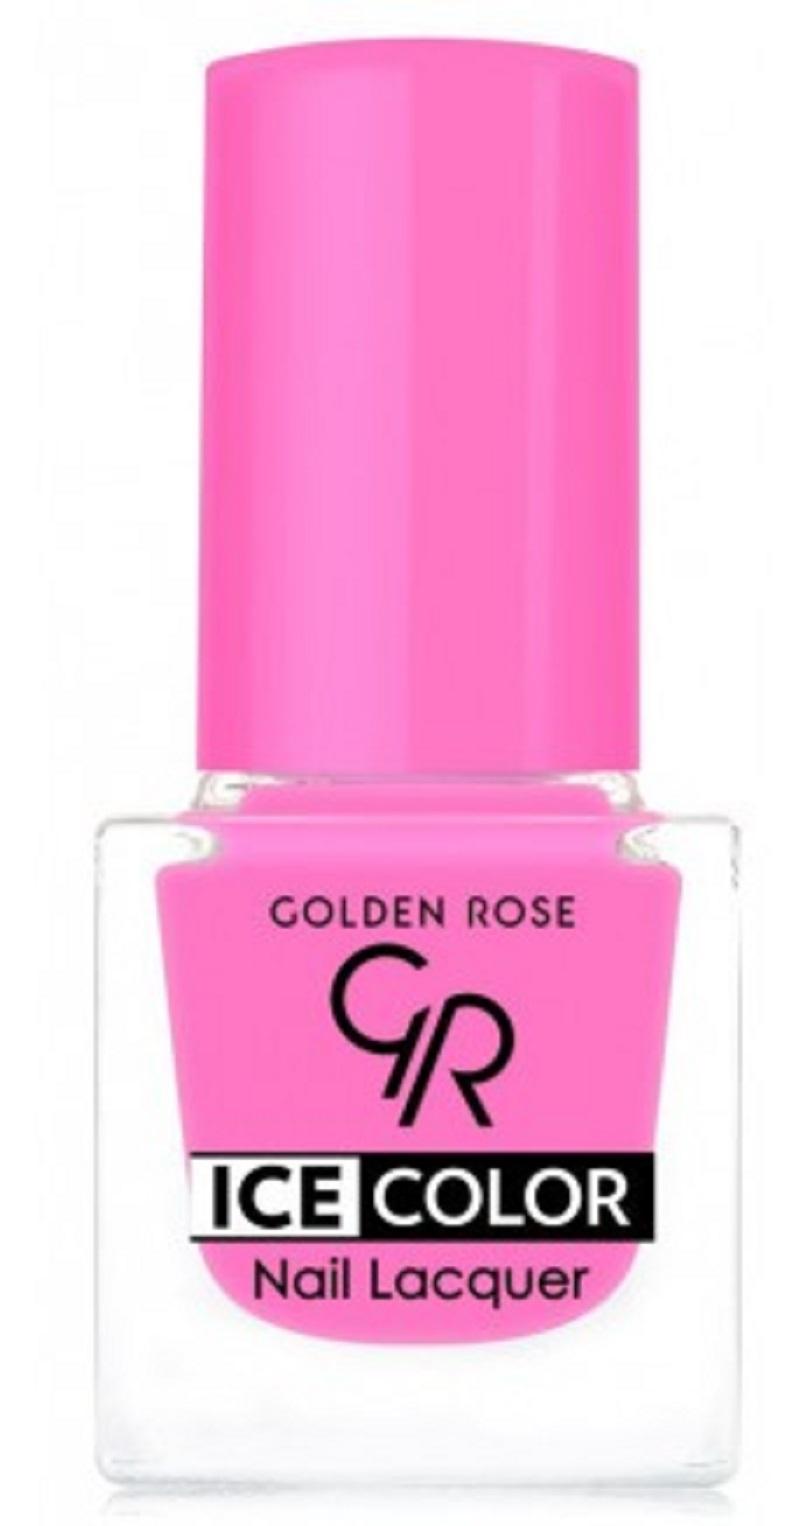 Golden Rose Ice Color Nail Lacquer Lak Na Nehty Mini 201 6 Ml Parfemomanie Cz